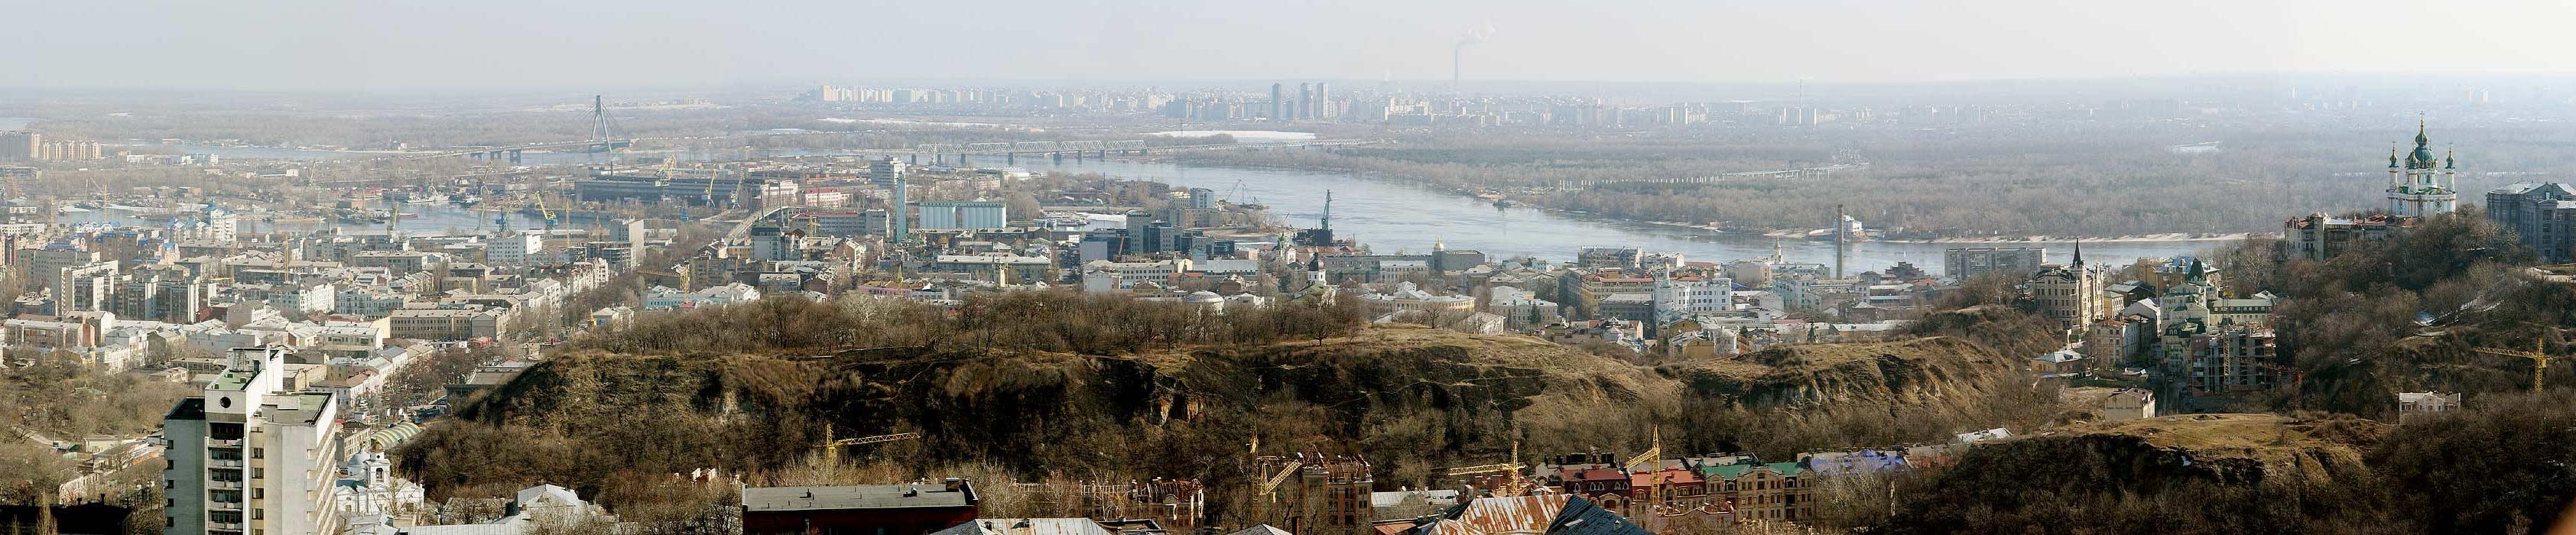 Schlossberg in Kiew